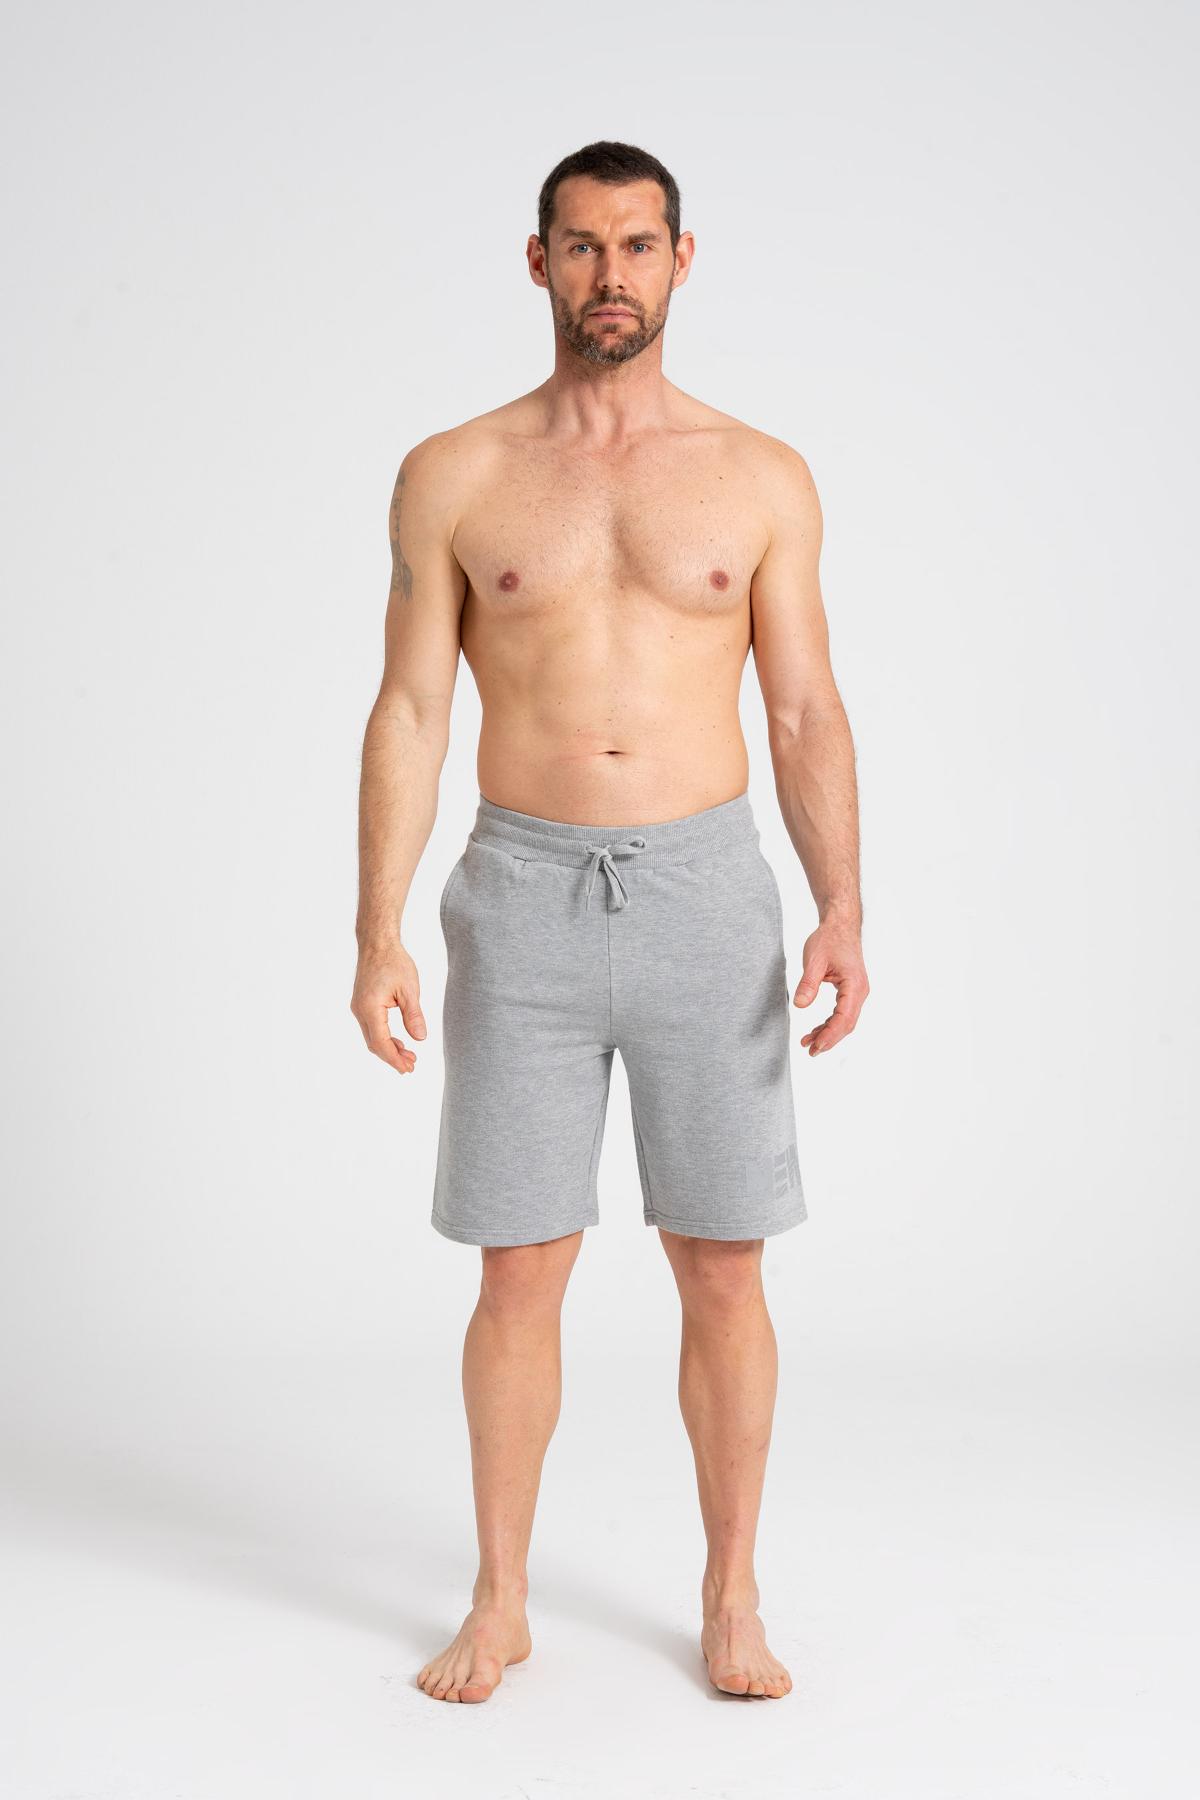 Normal Fit Men's Shorts newces-5011-GM